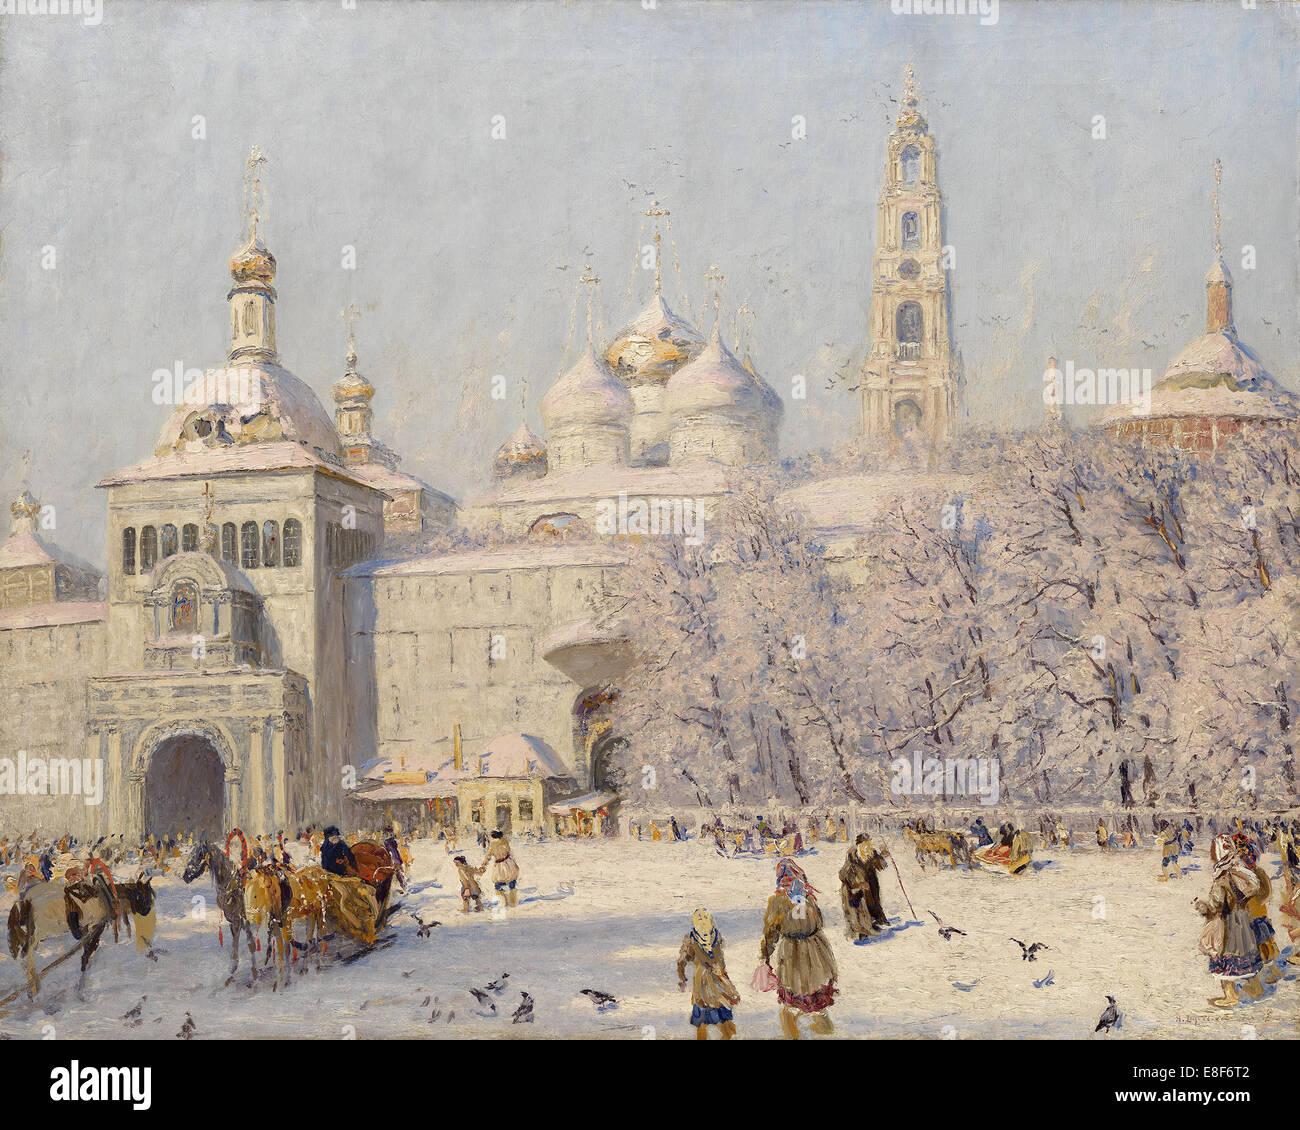 Blagovest. Artist: Dubovskoy, Nikolai Nikanorovich (1859-1918) - Stock Image